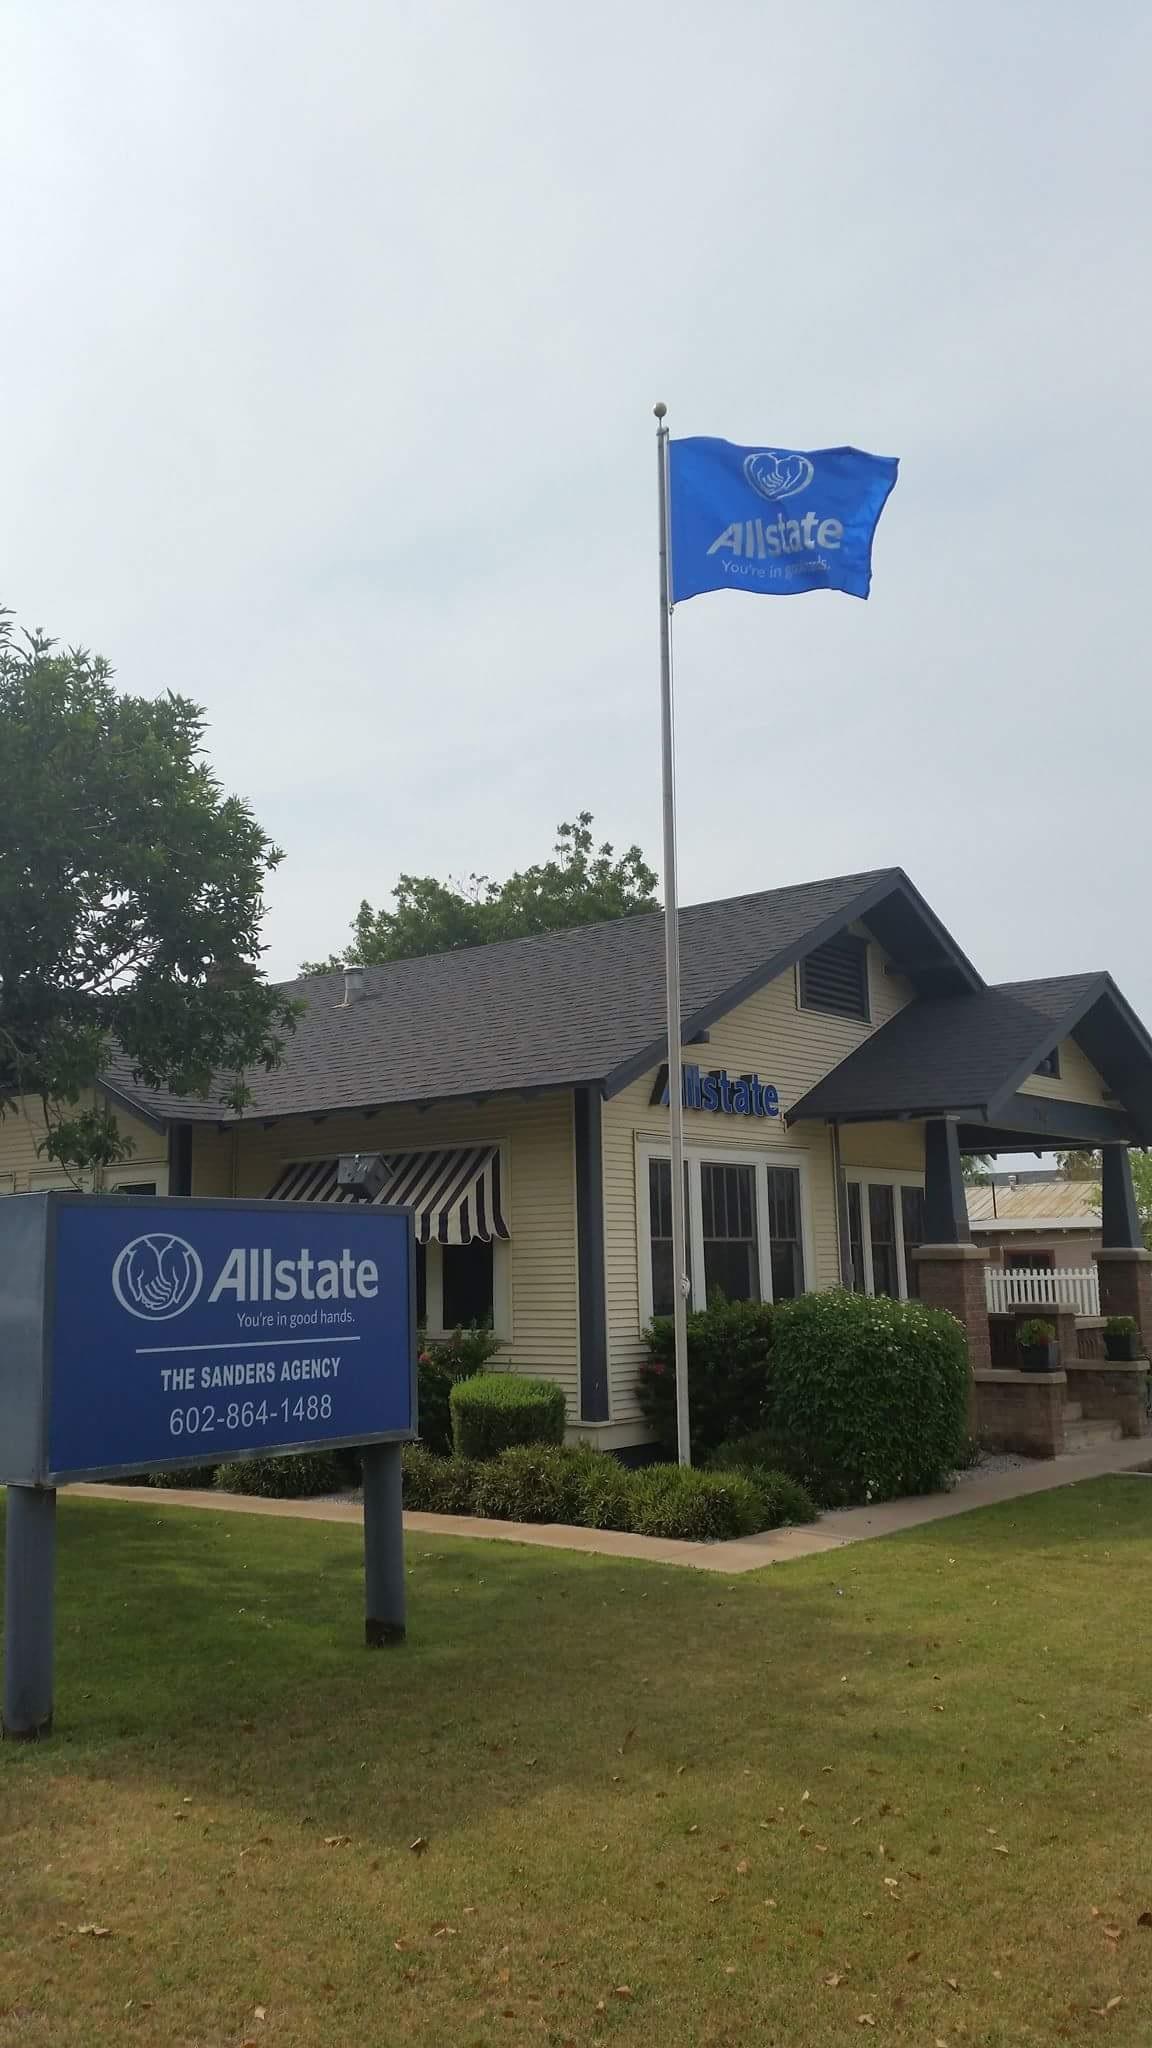 Mickey Sanders: Allstate Insurance image 2